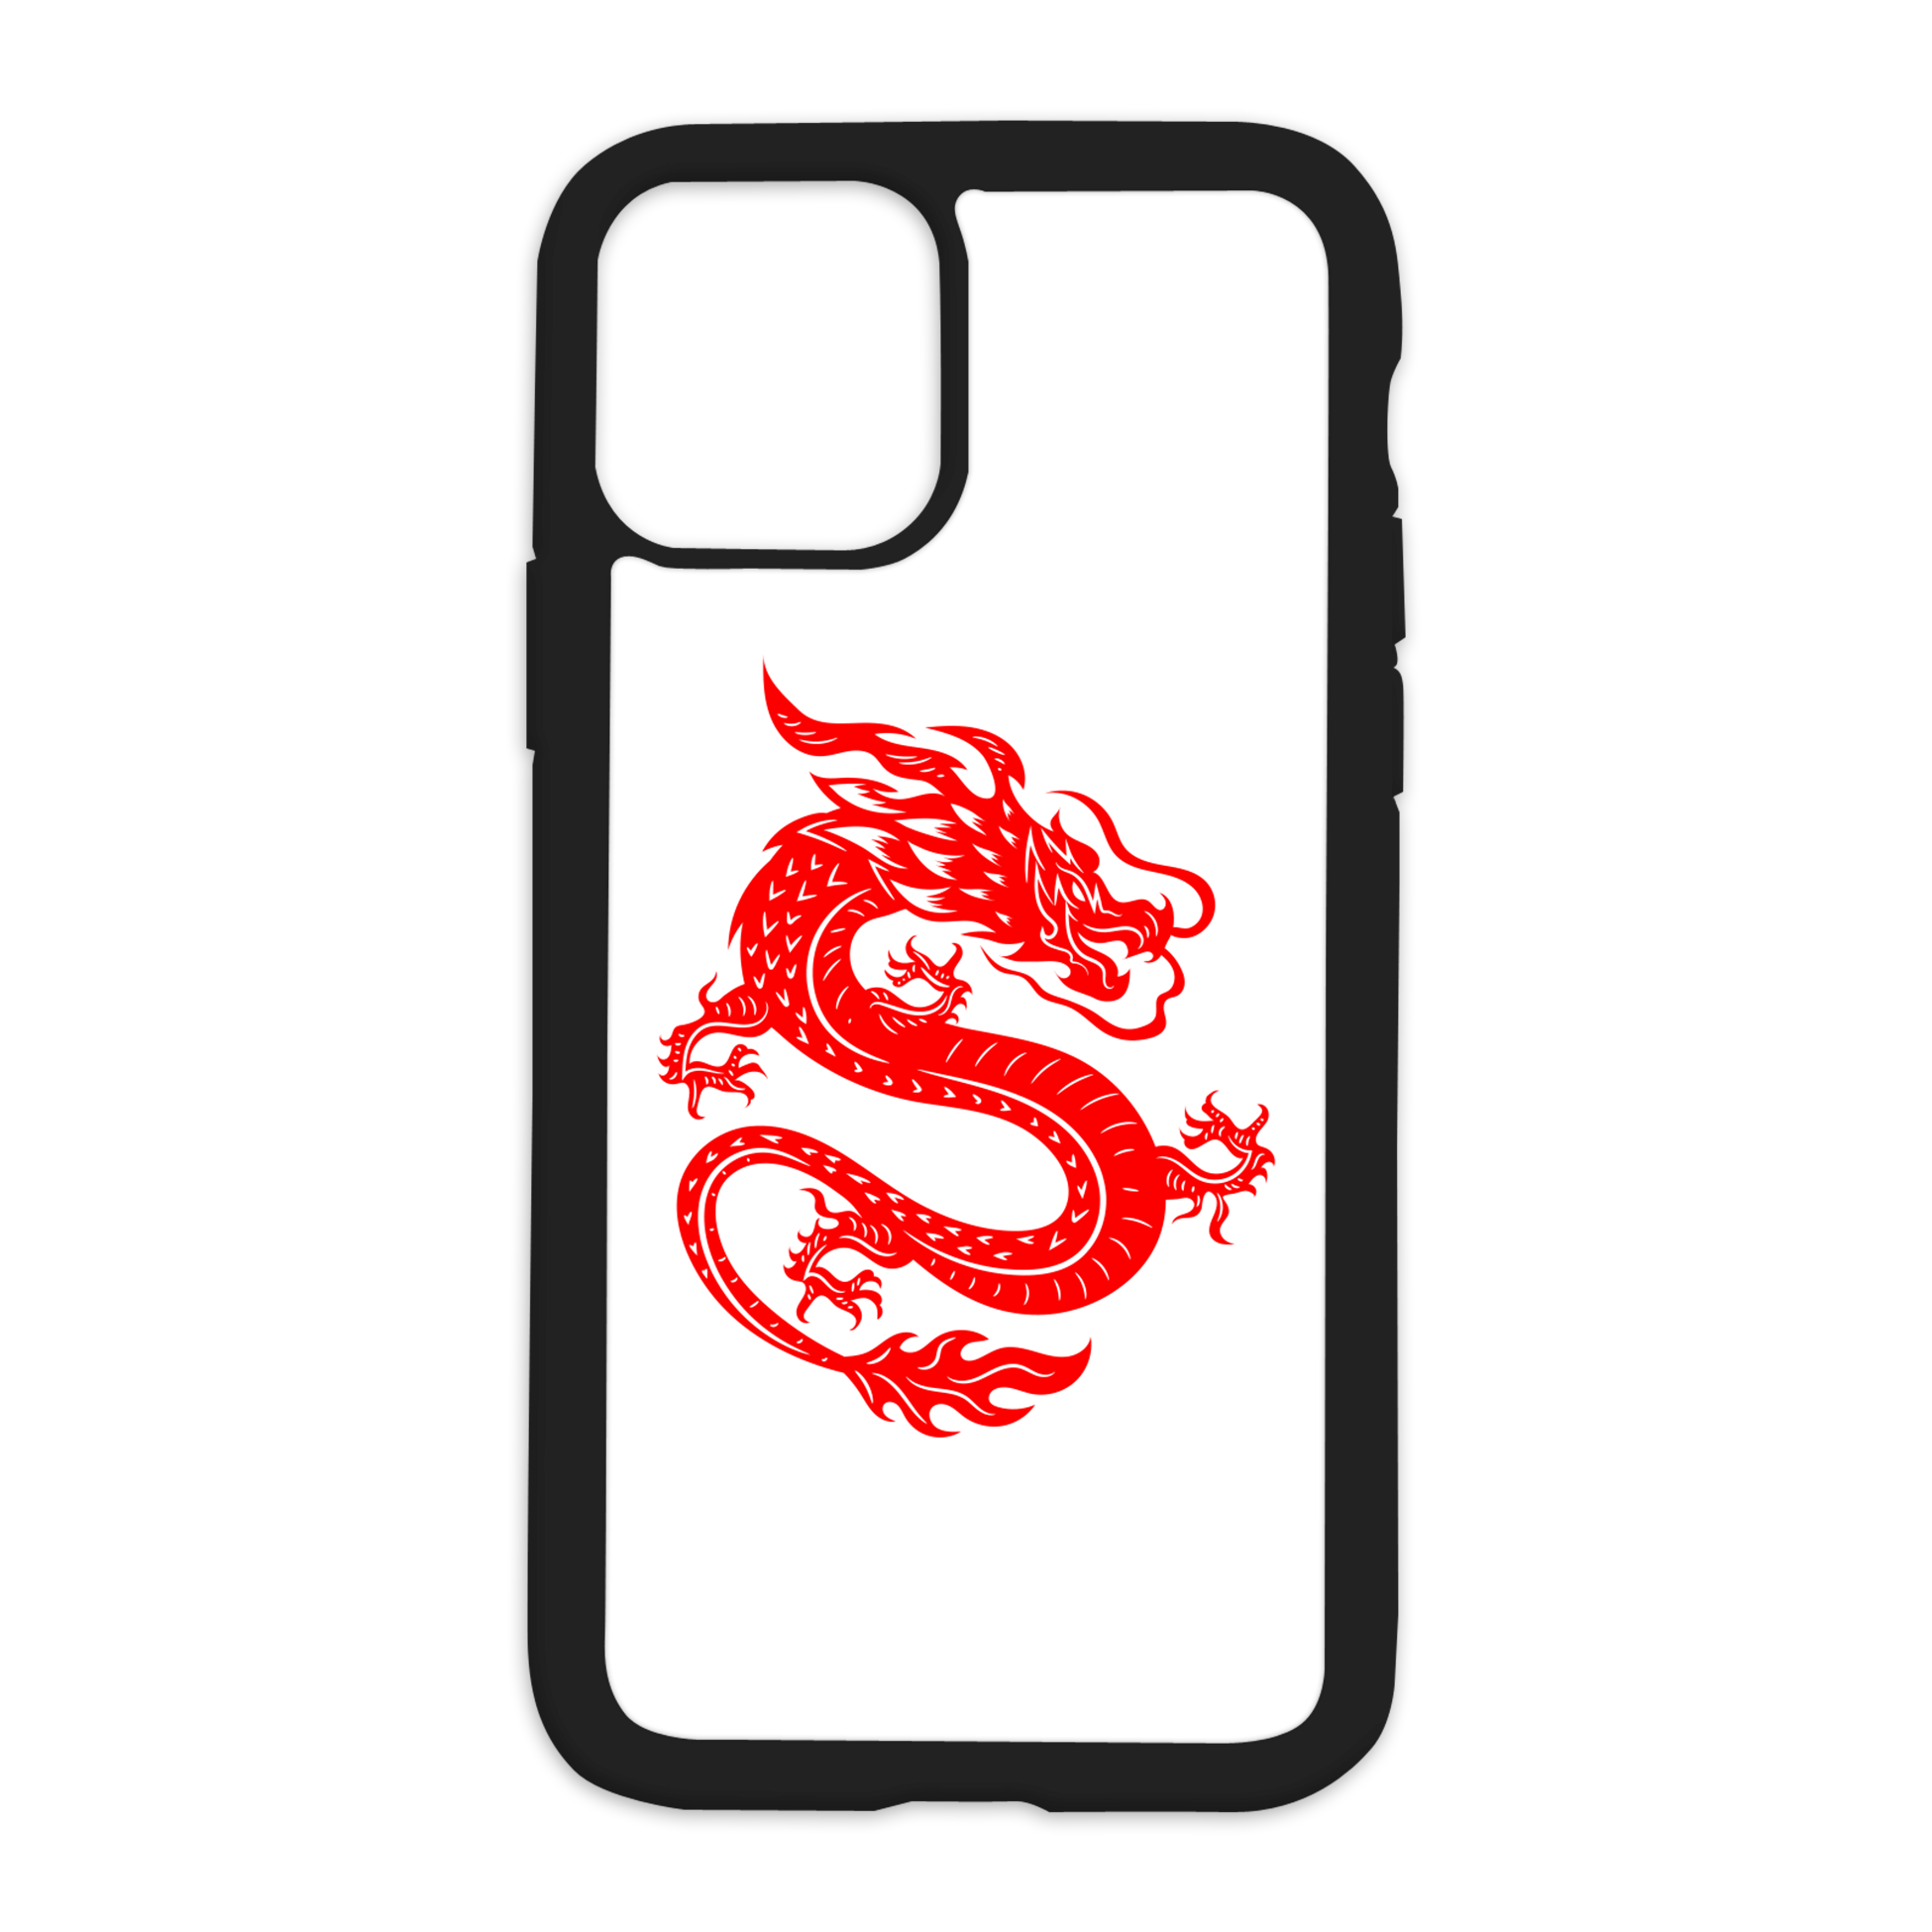 Red Dragon Design On Black Phone Case - 12 Pro Max